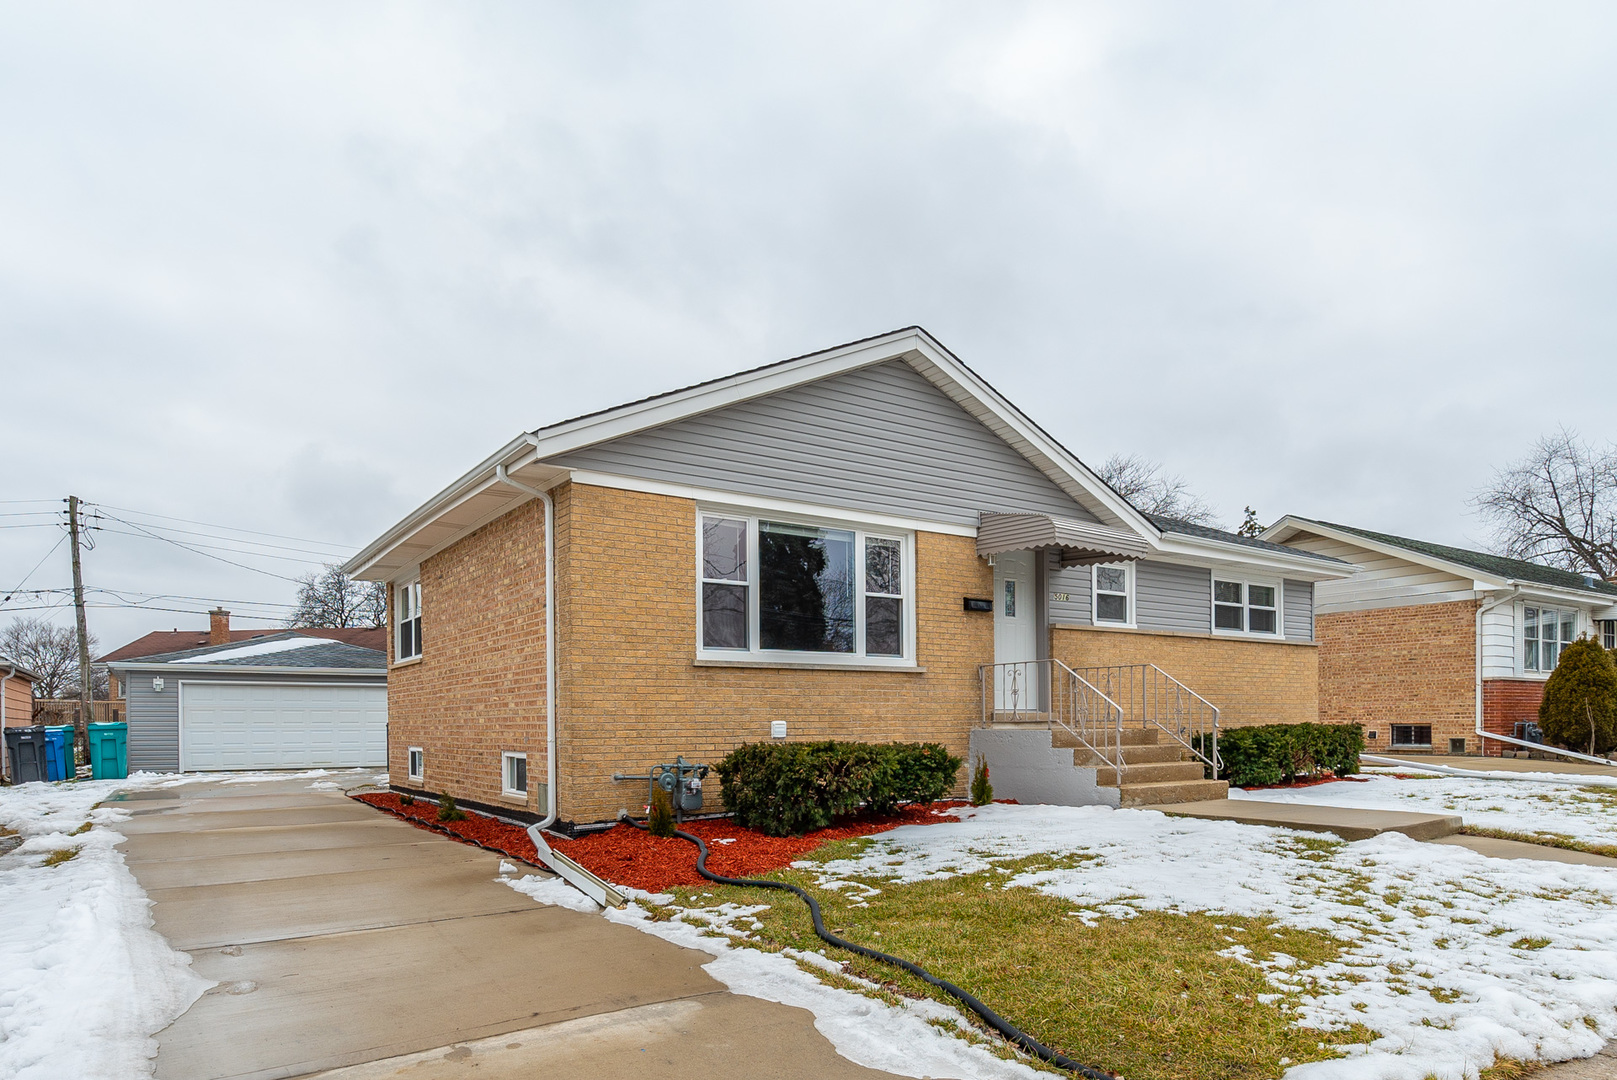 5016 West Hawthorne, Hillside, Illinois, 60162